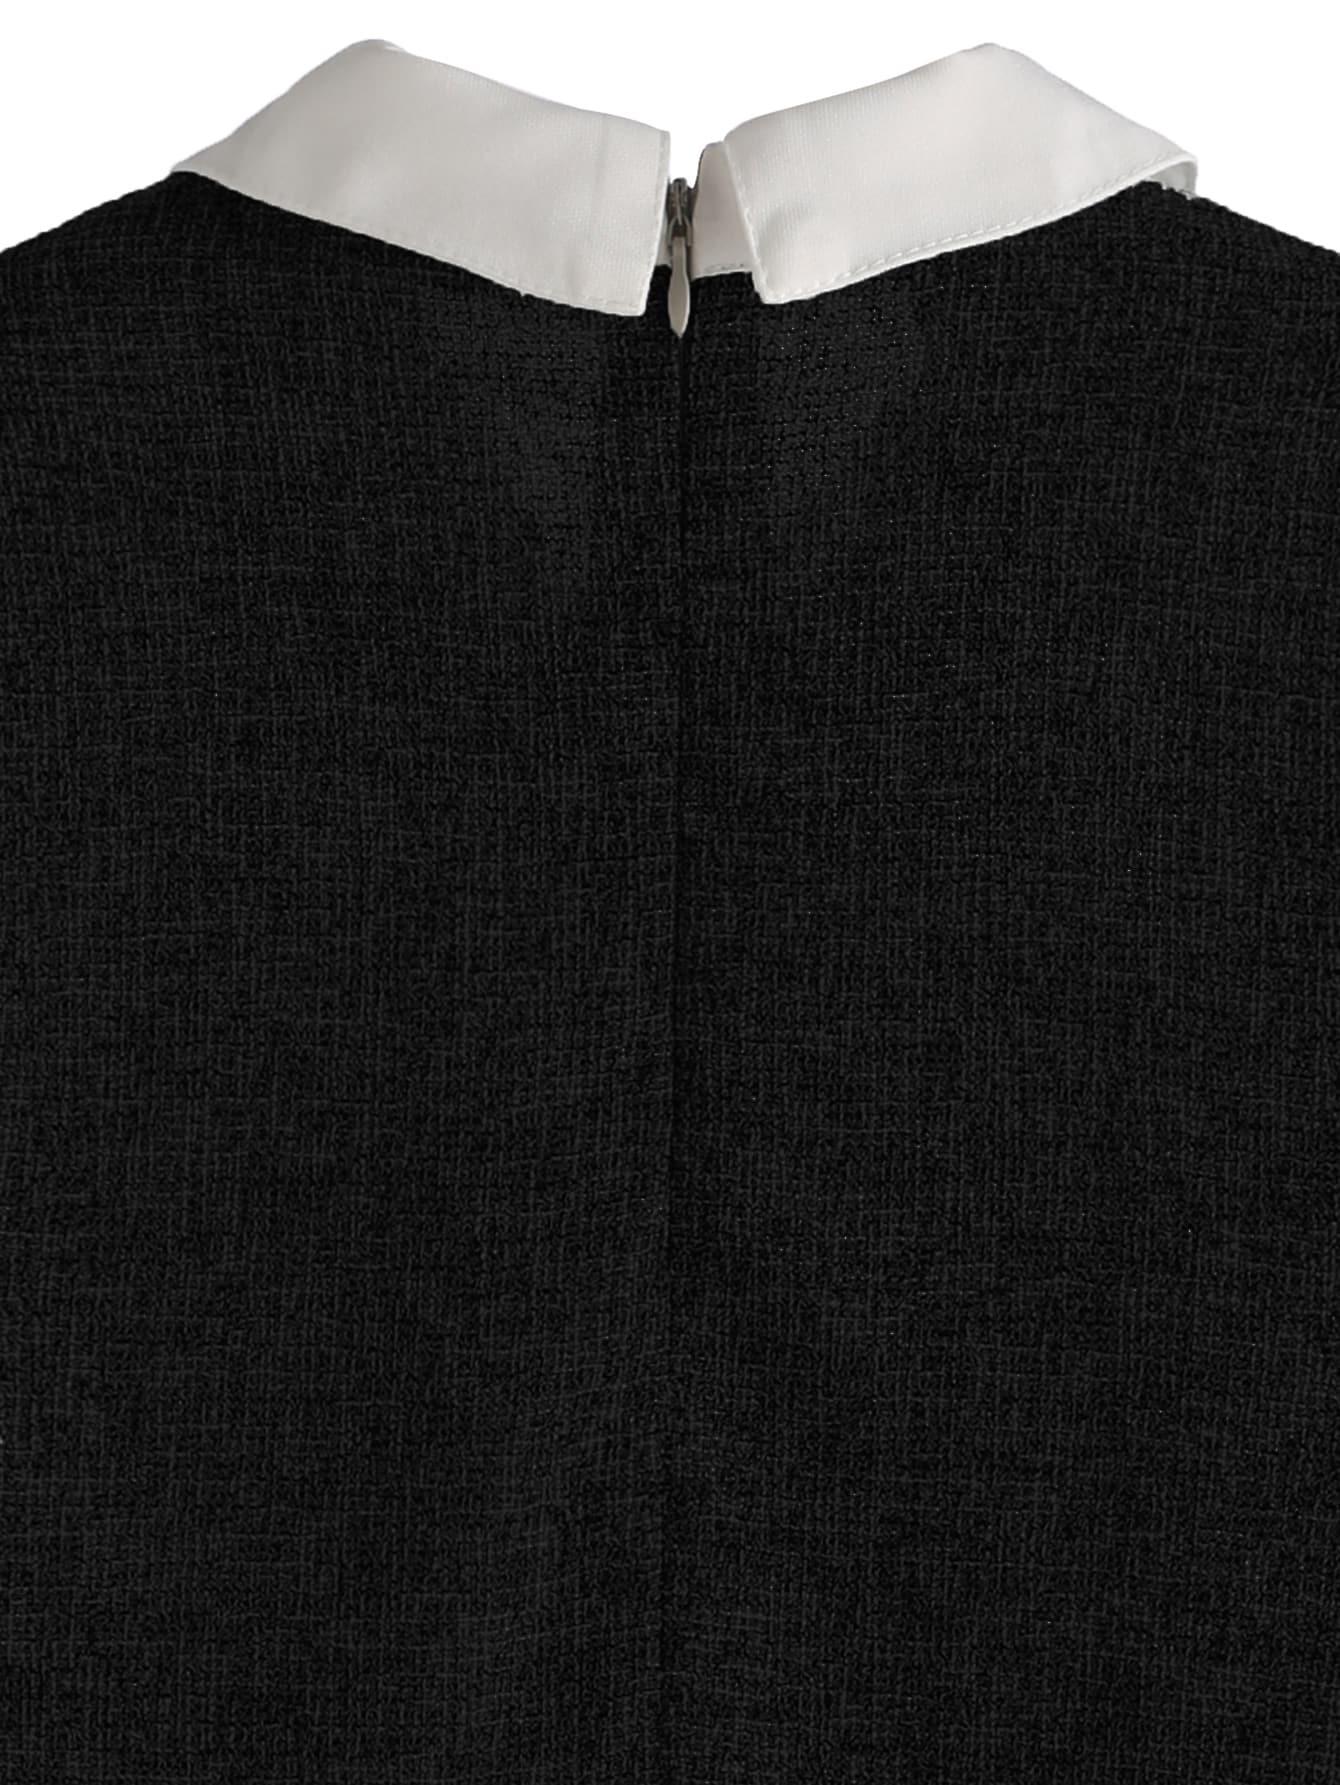 blouse161014103_2